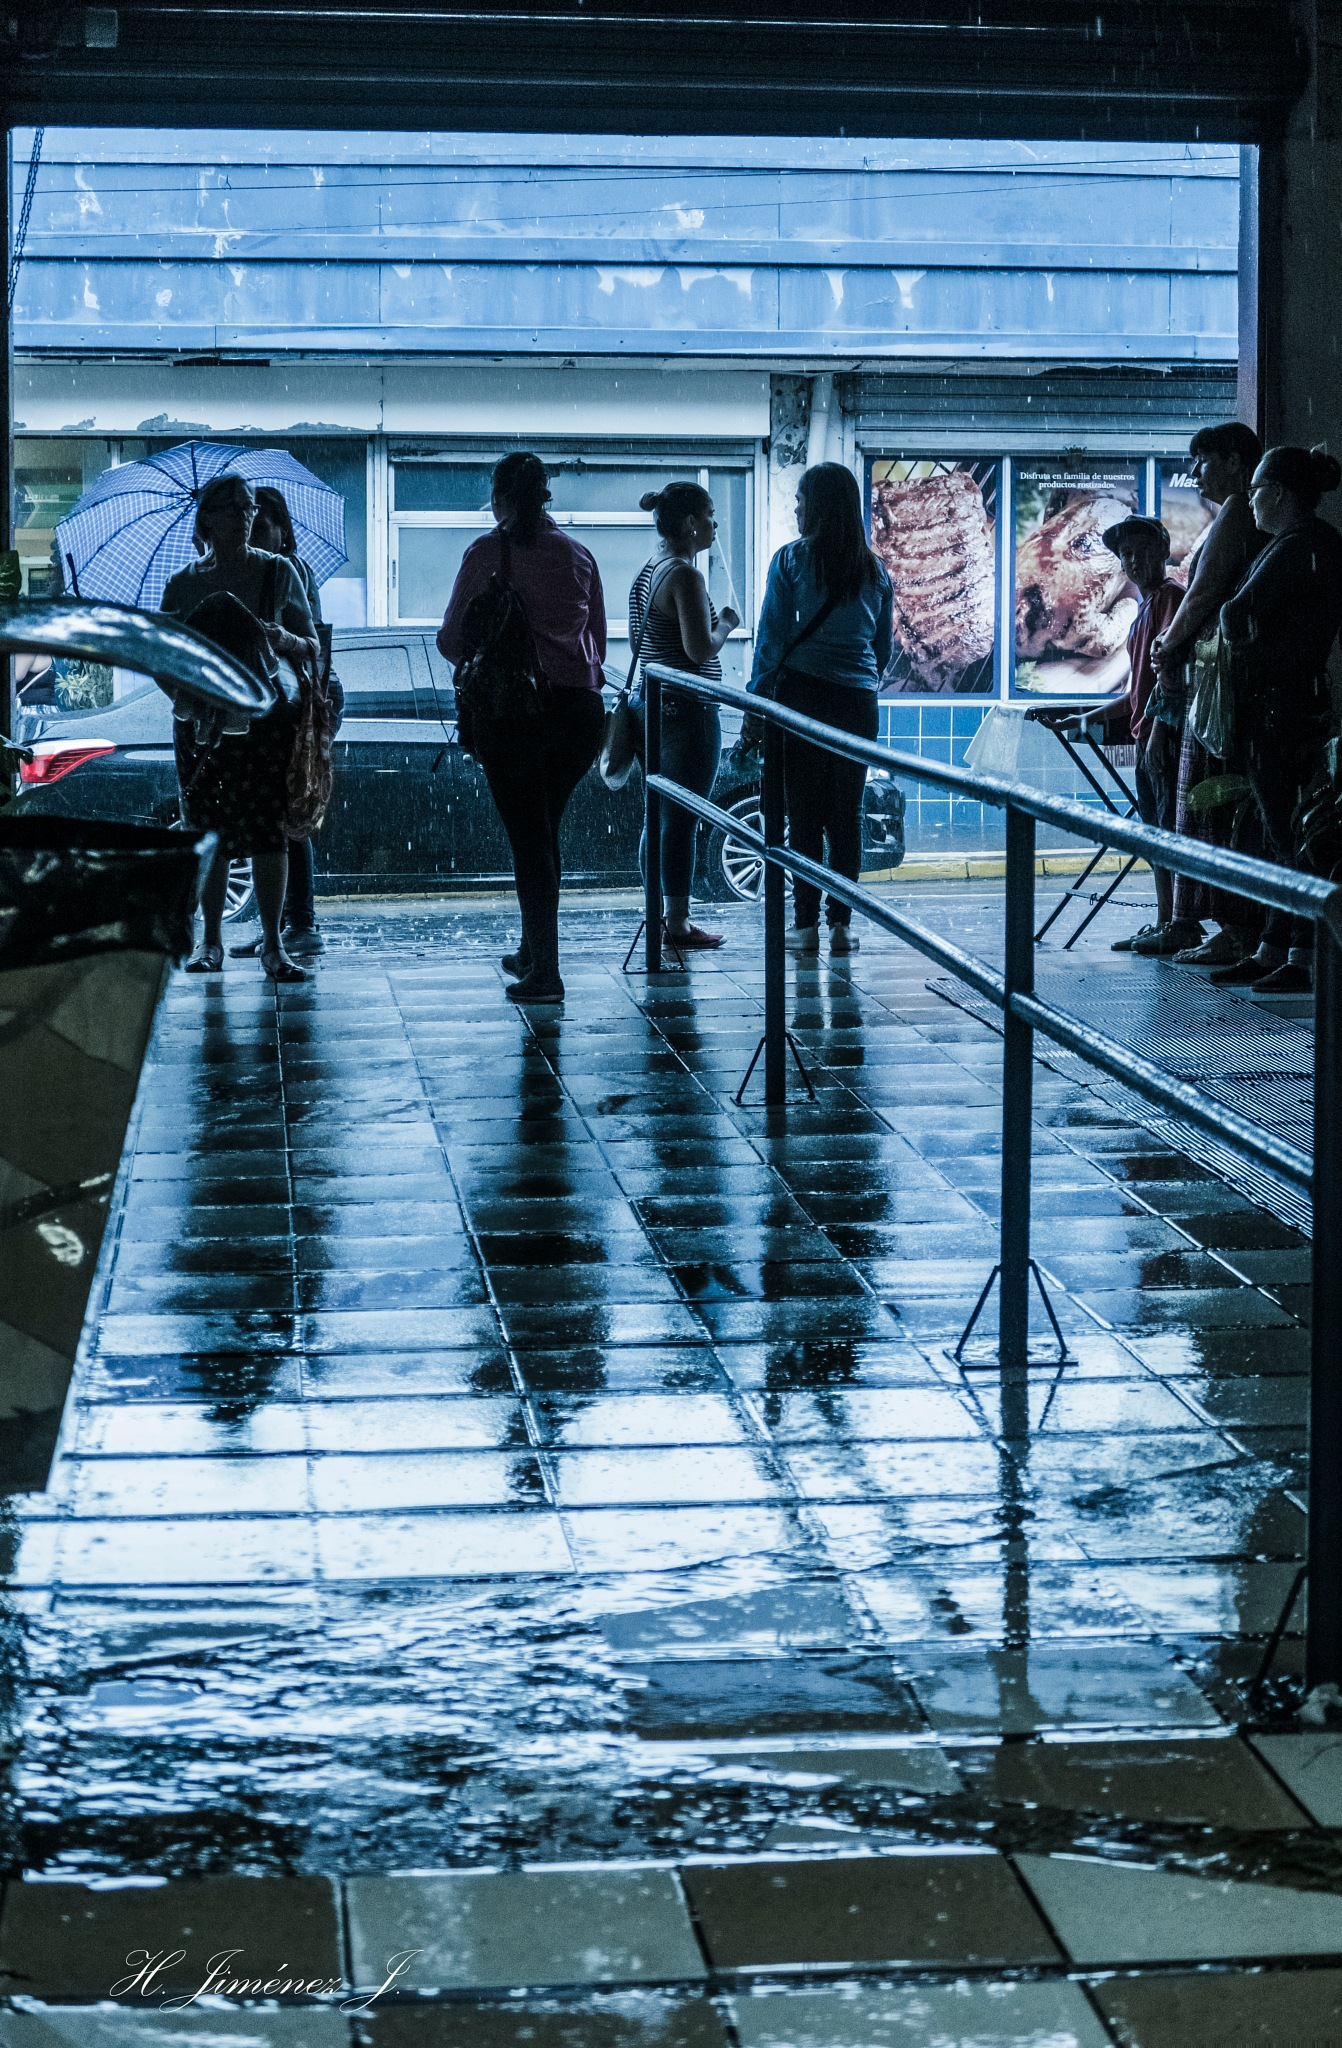 llueve fuera y adentro!!! by Henry Jiménez J